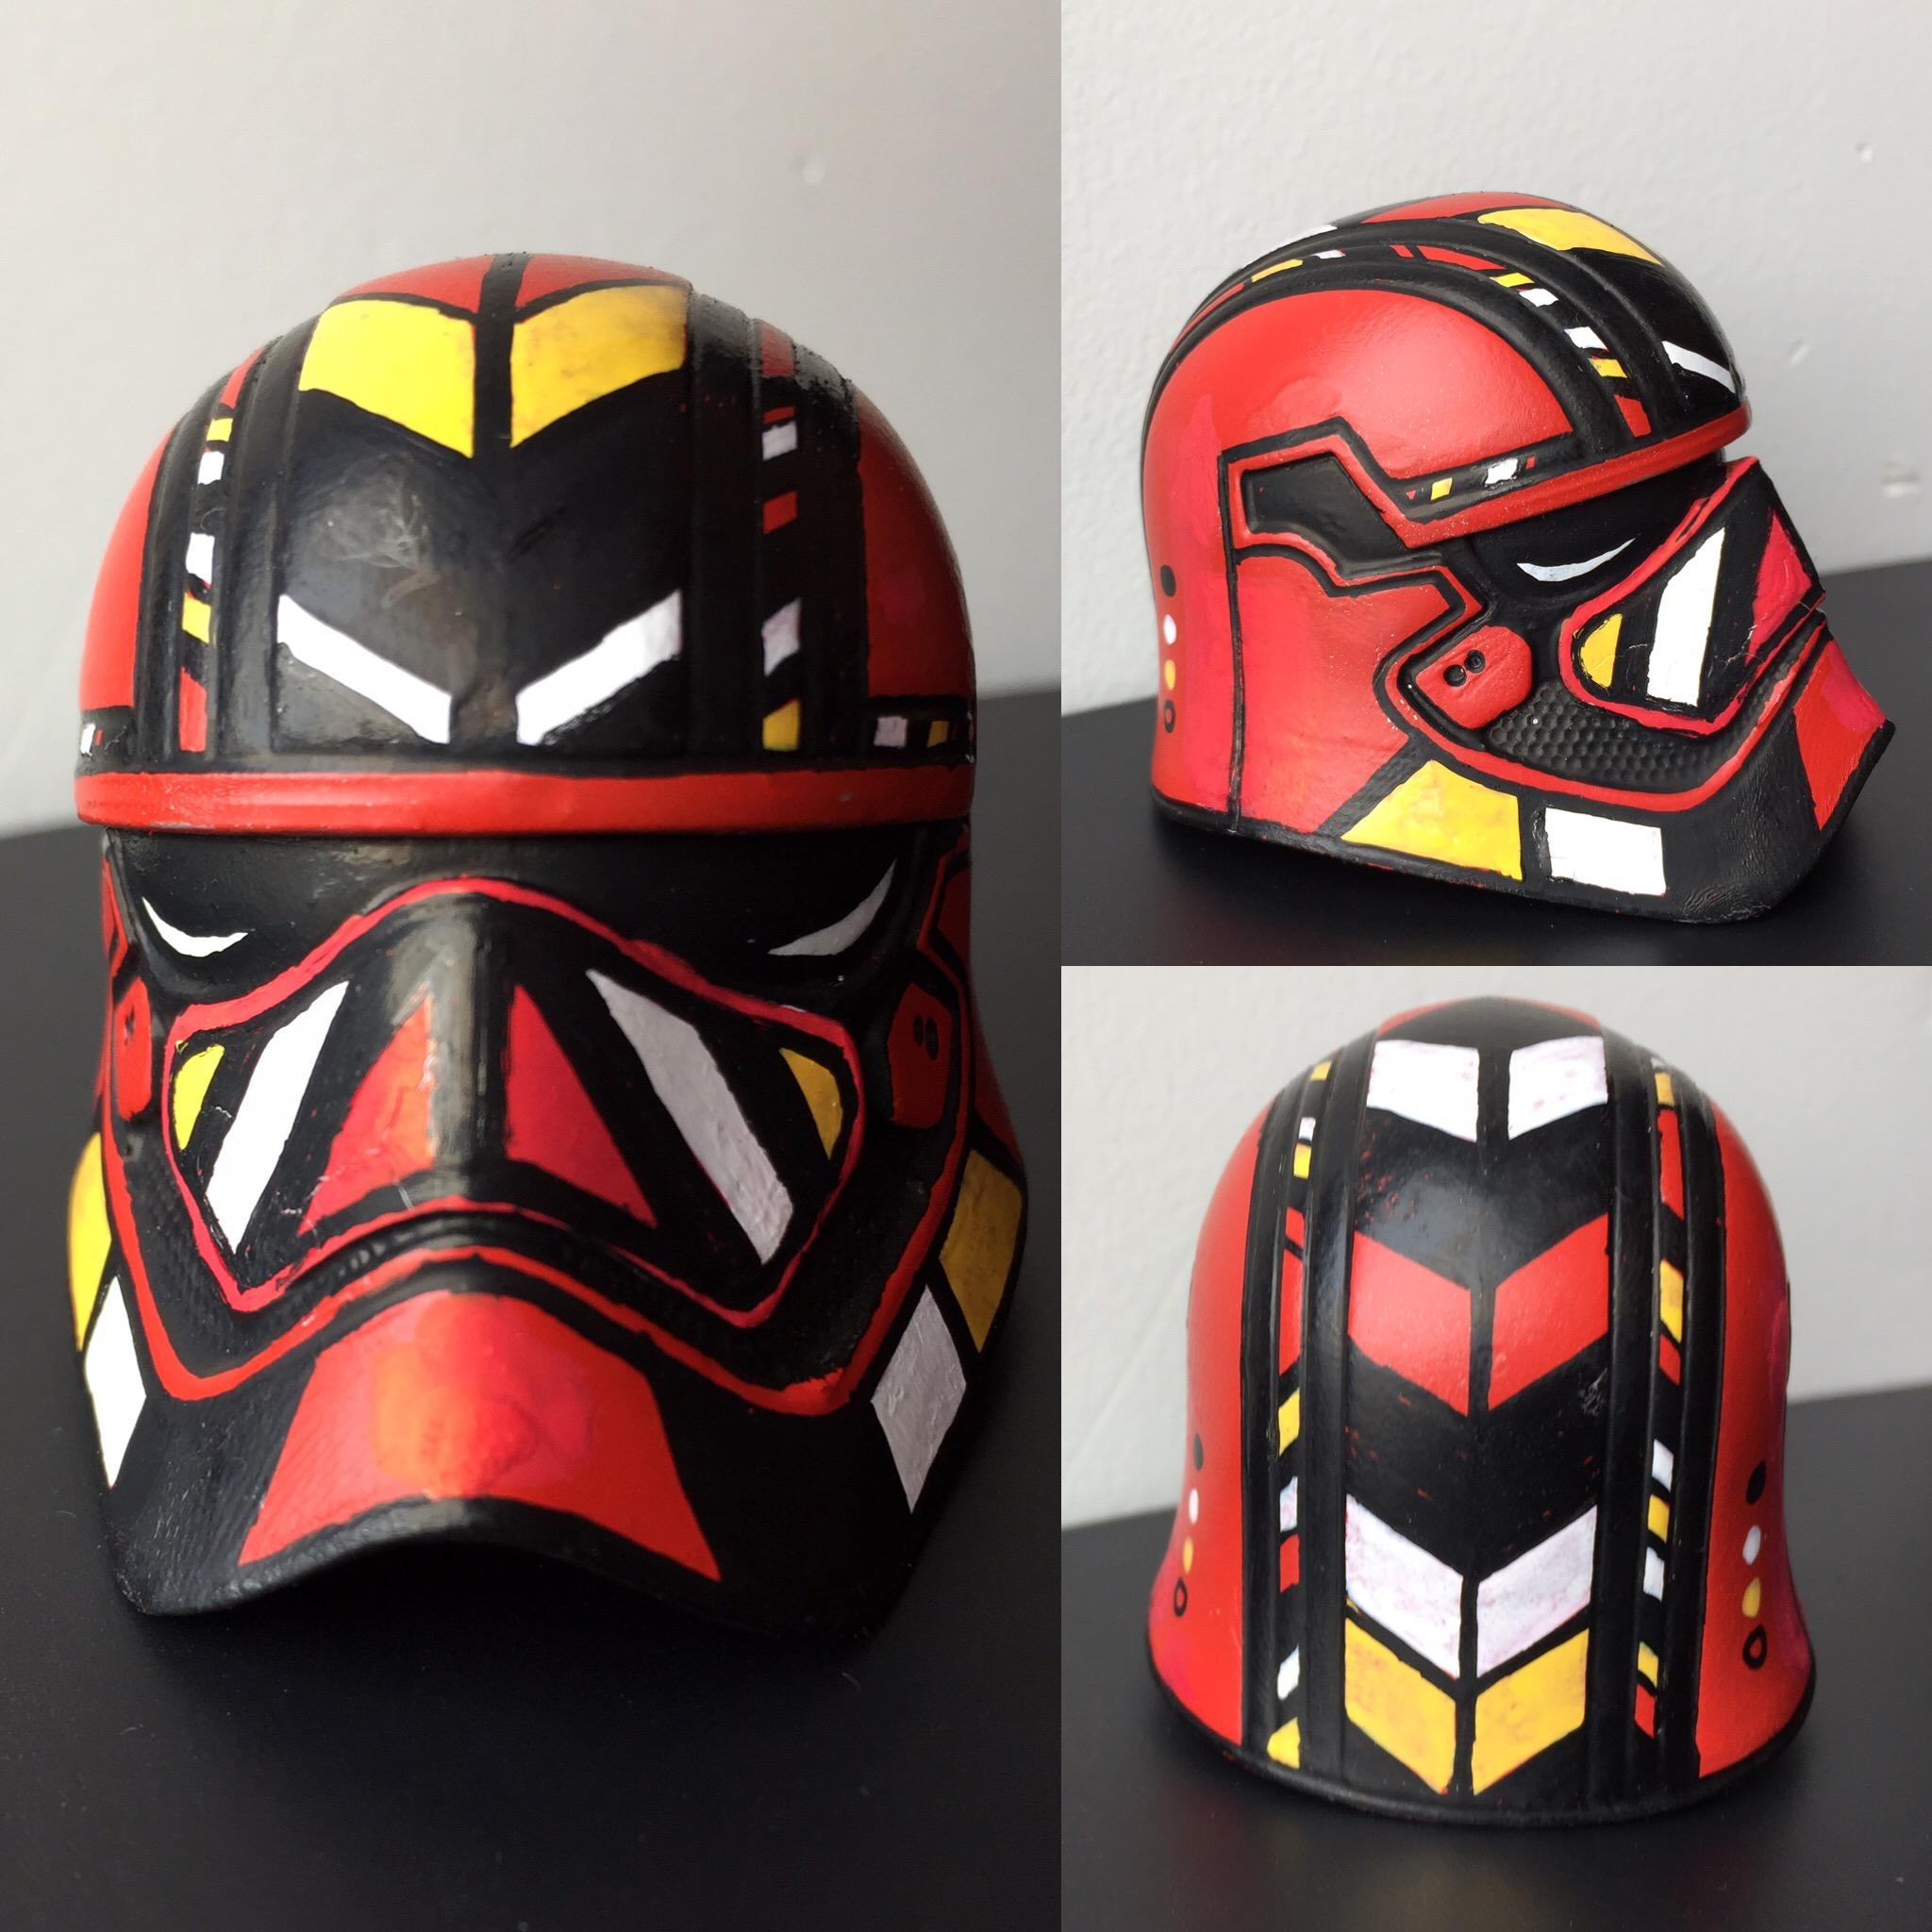 1/6th Scale Phasma Helmet